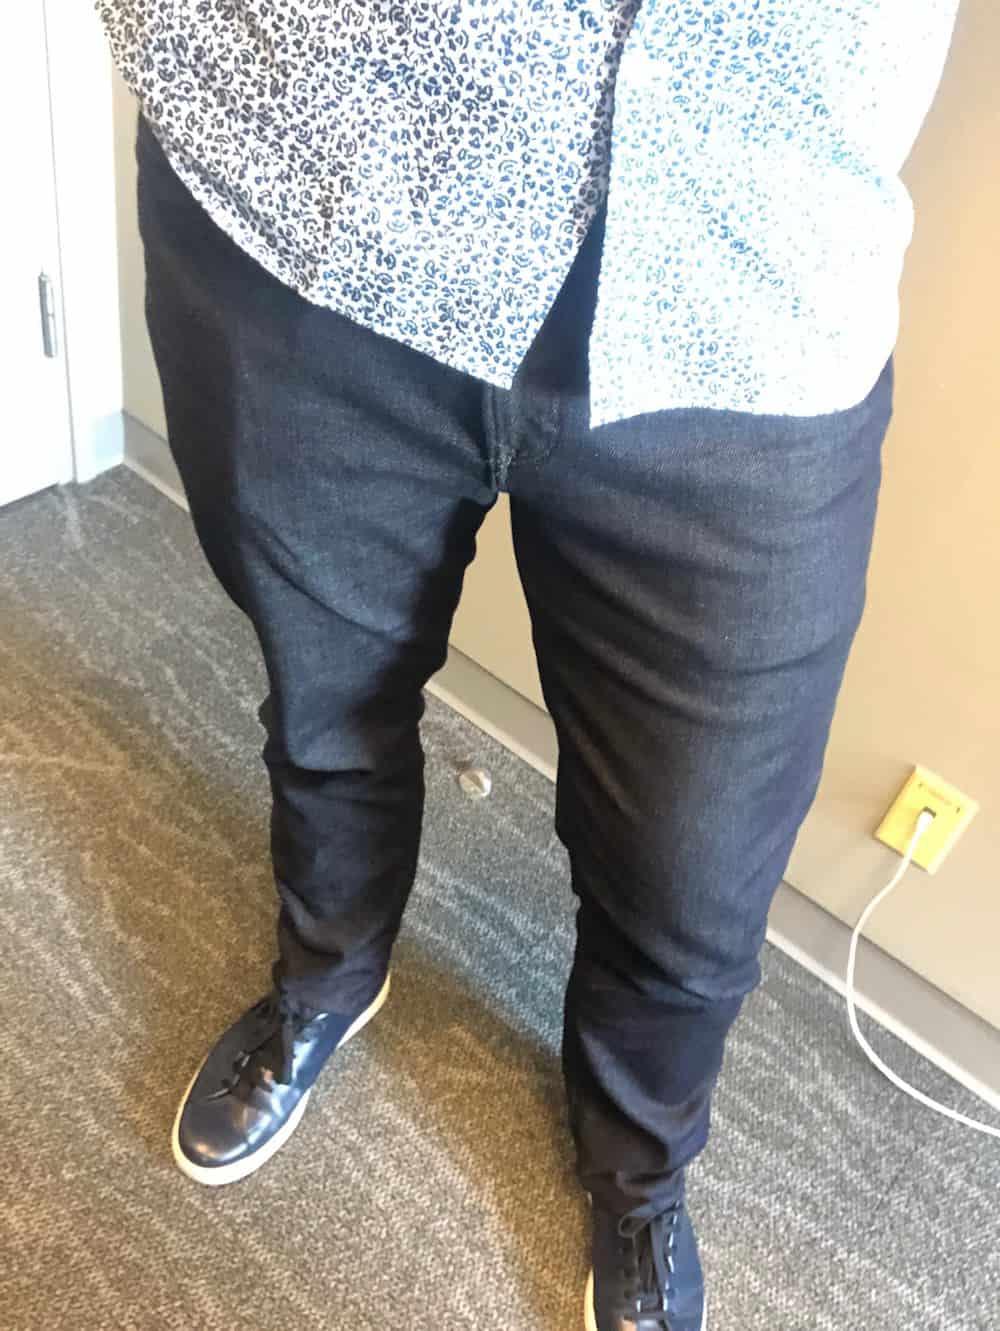 Shirt untucked Banana Republic mens jeans - dark blue Traveler jeans